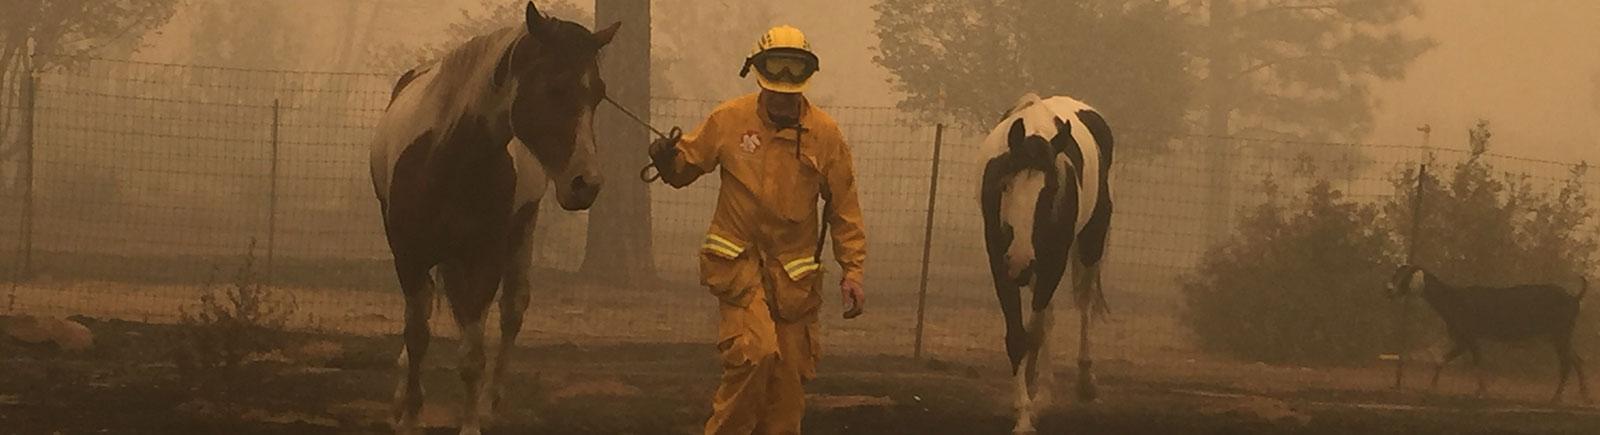 rescuer leading horses through smoky area